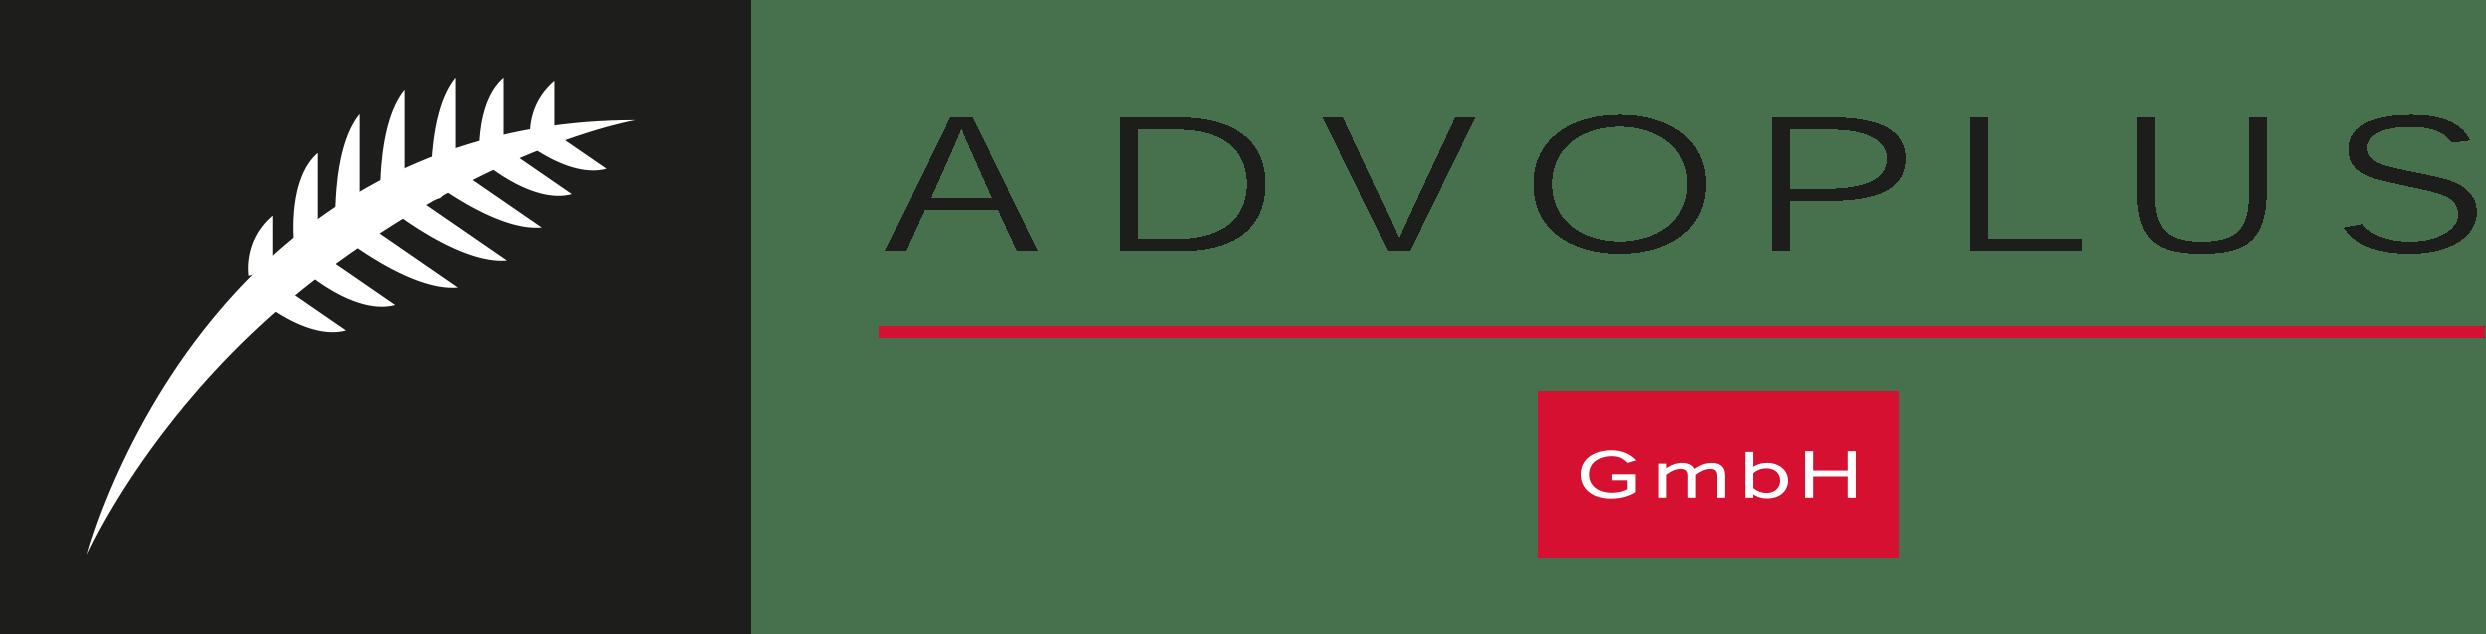 Advoplus GmbH